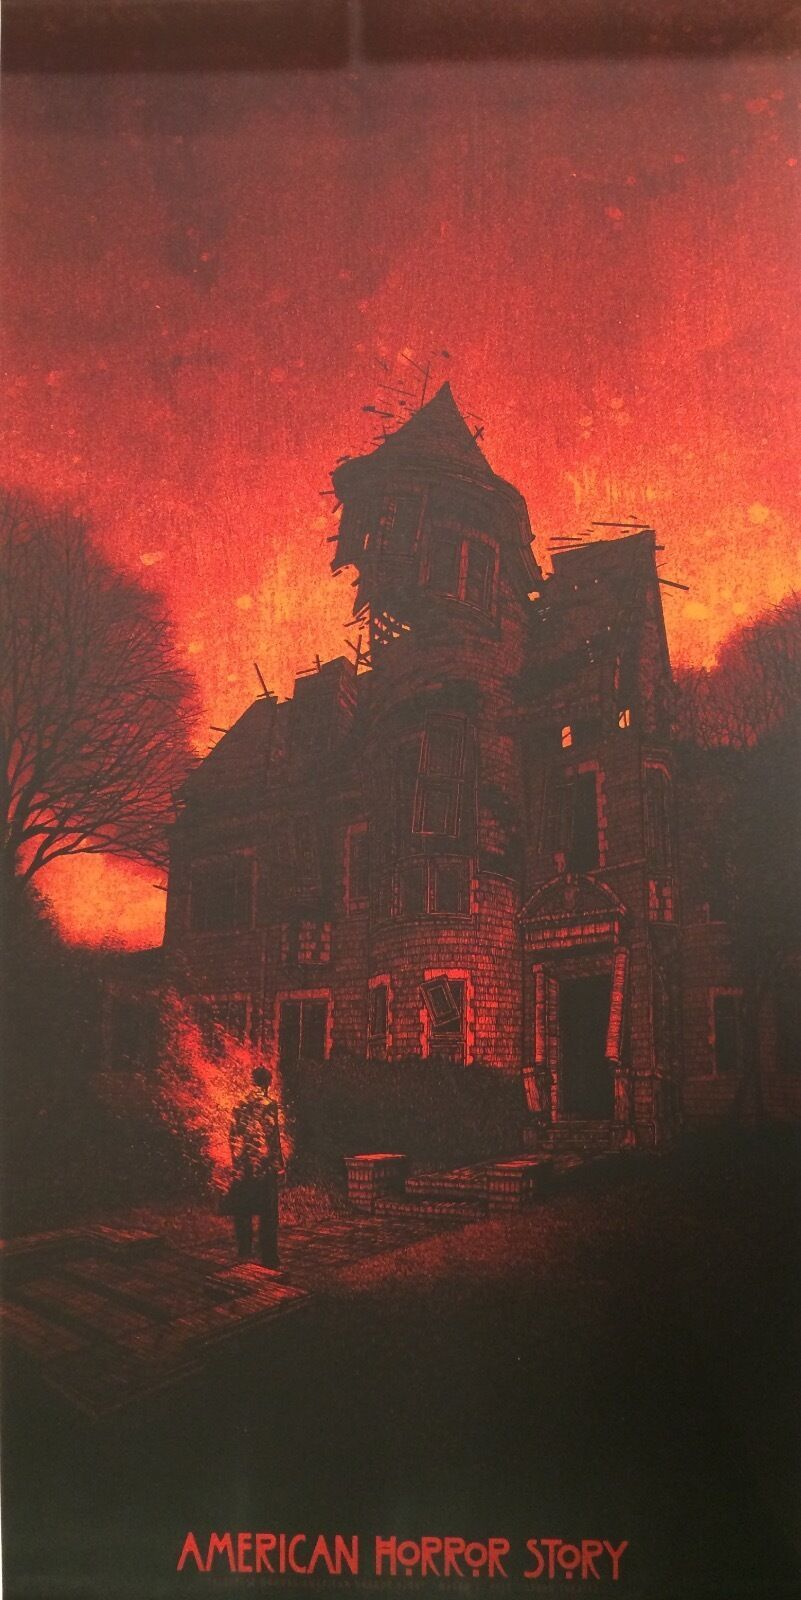 Details about Daniel Danger American Horror Story Season 1 240/300 Not Mondo Gallery 1988